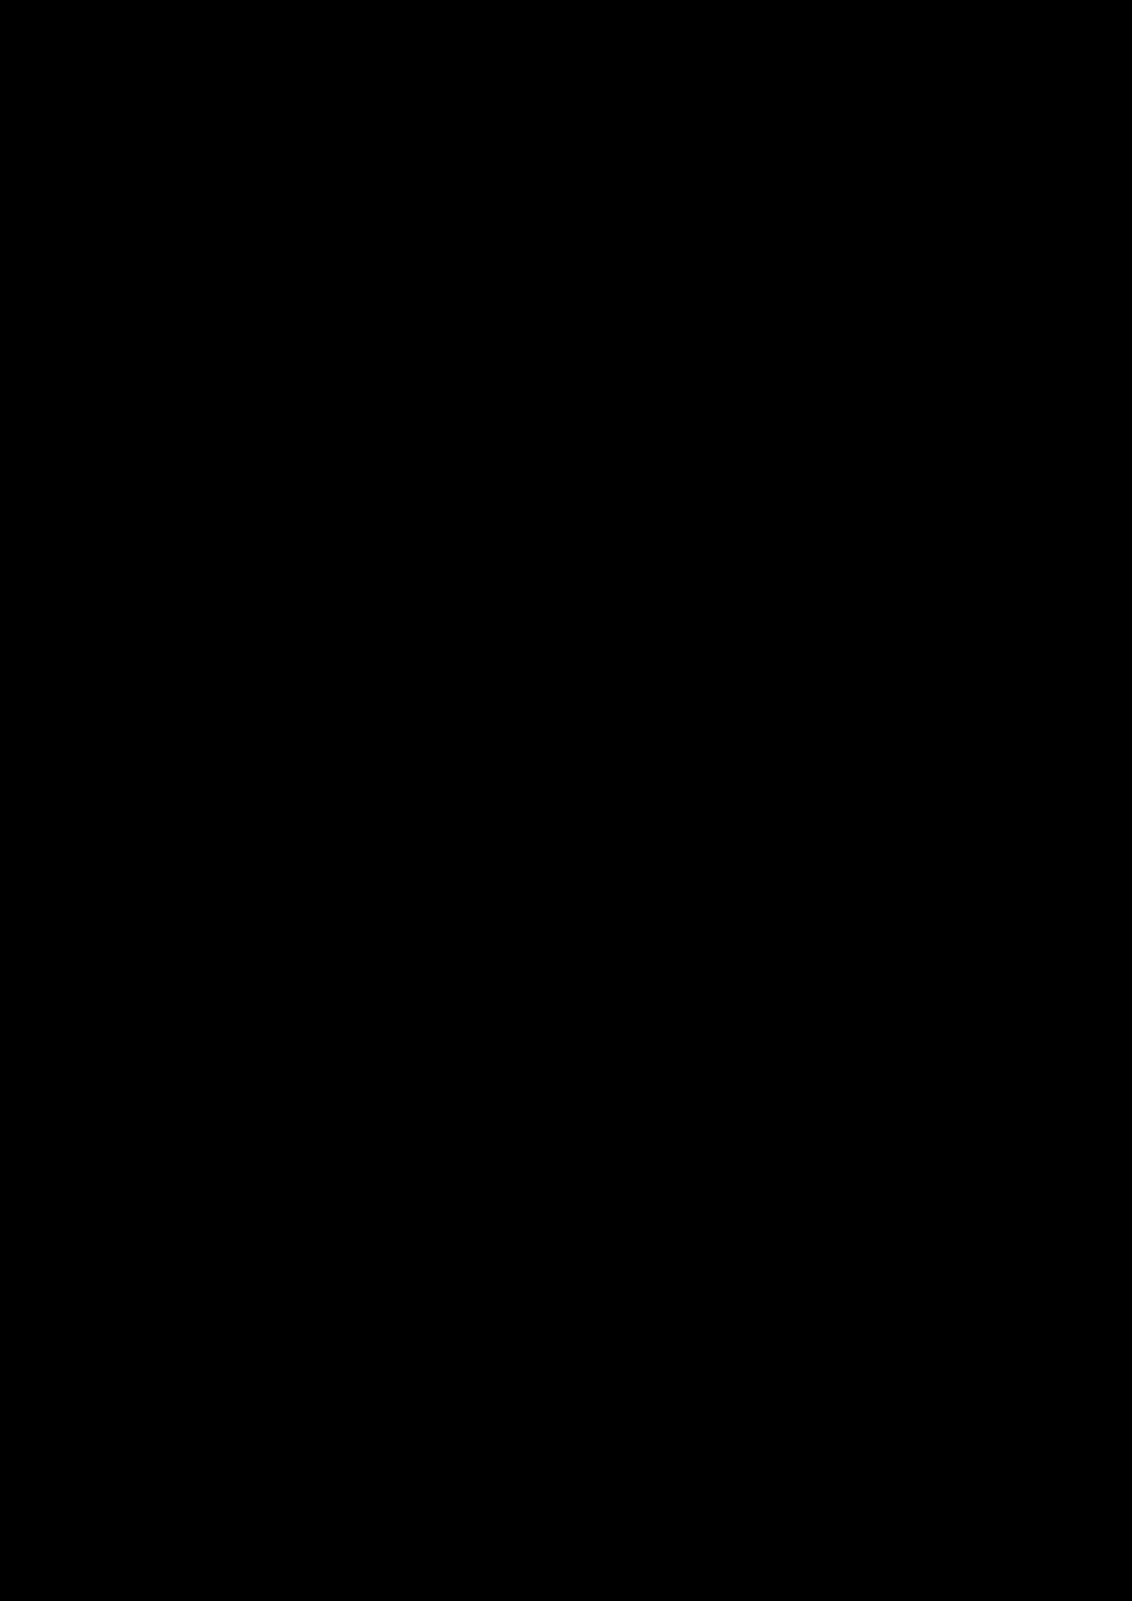 18 berez slide, Image 13